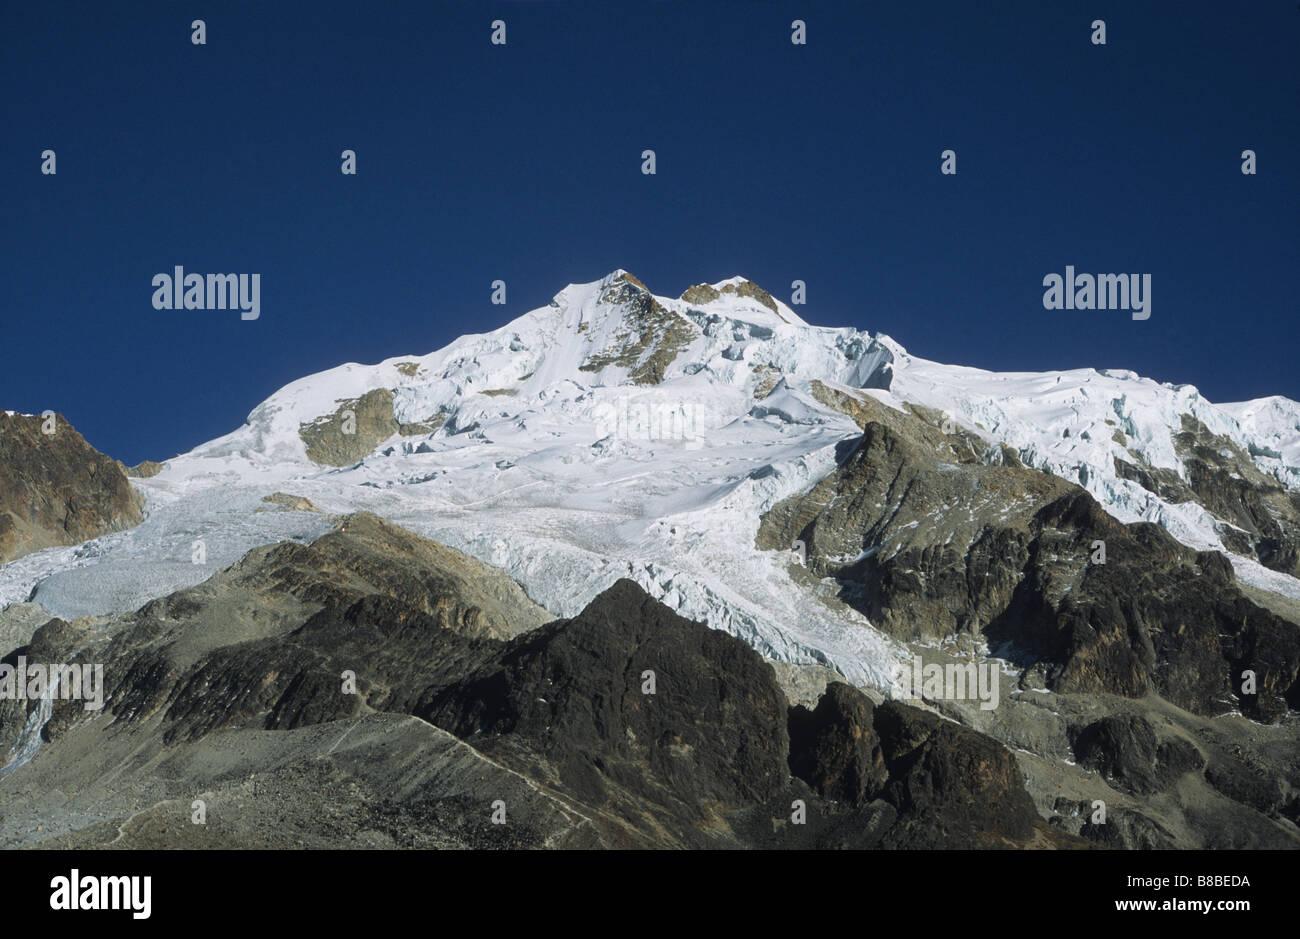 Receding glacier on Mt Huayna Potosi, Cordillera Real, Bolivia - Stock Image